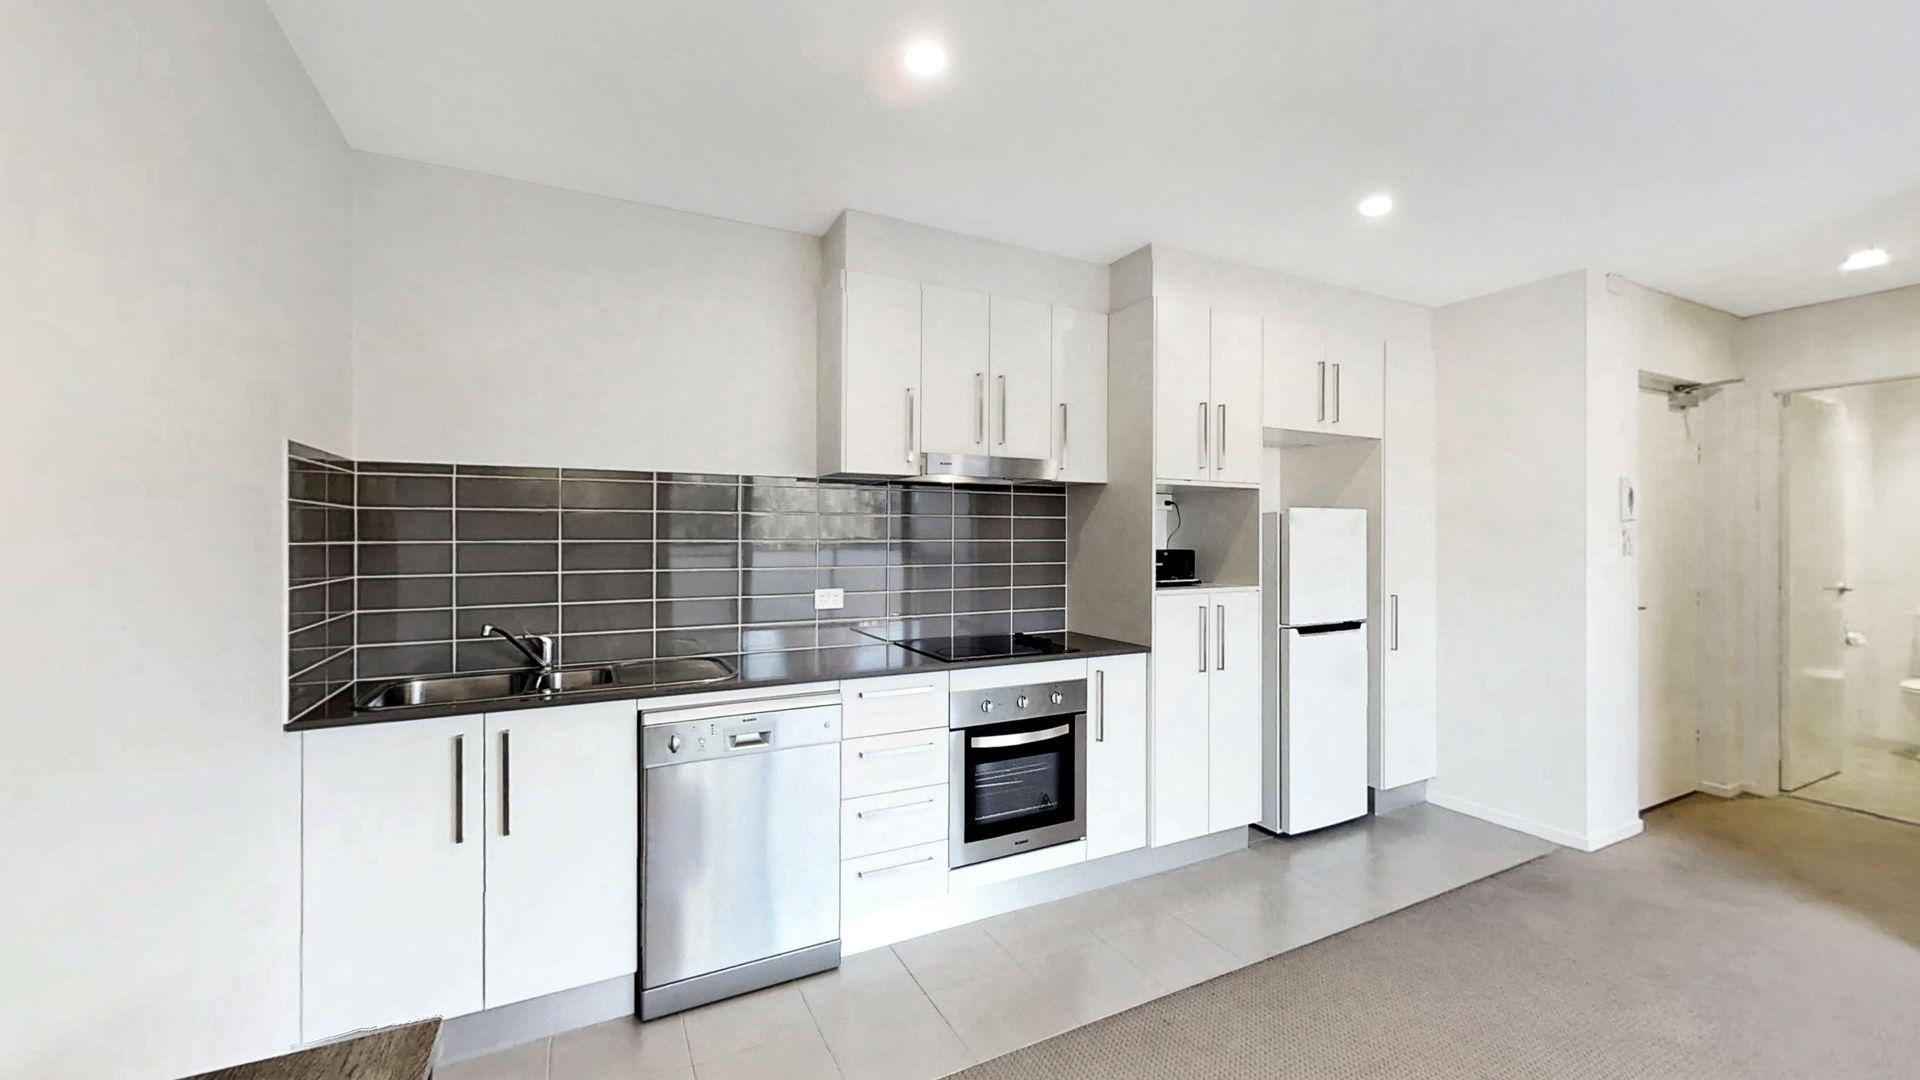 14/36 Antill Street, Queanbeyan NSW 2620, Image 2